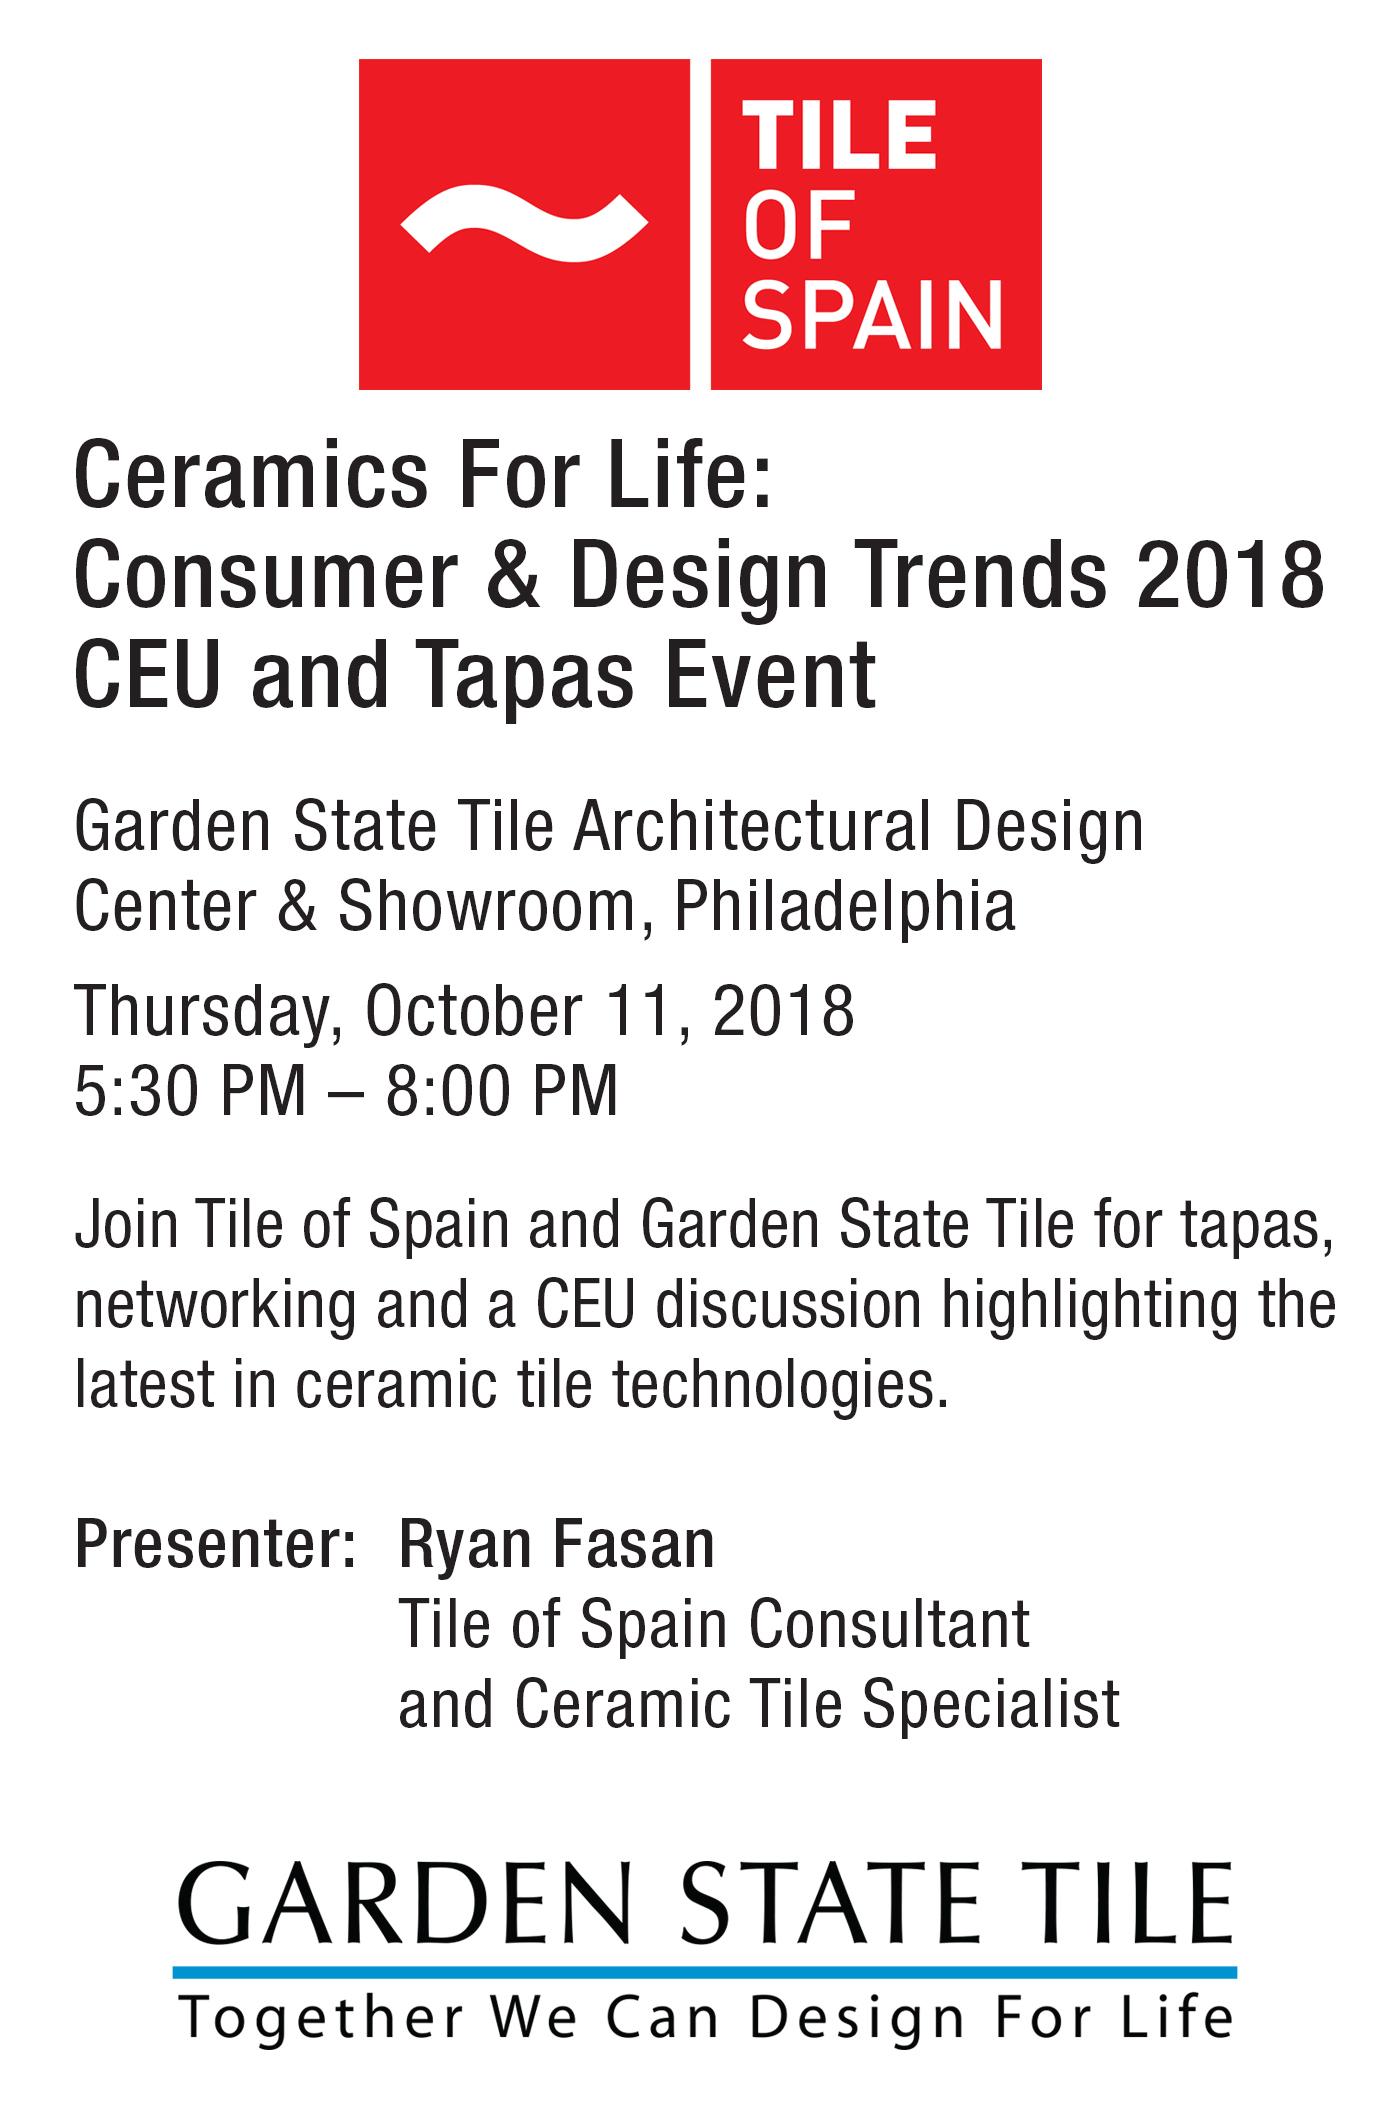 Neat Rsvp On Eventbrite Tile Life 2018 Ceu Event Spain Ceramics Garden Garden Tile Roselle Park Nj Garden Tile Corporate Office houzz-02 Garden State Tile